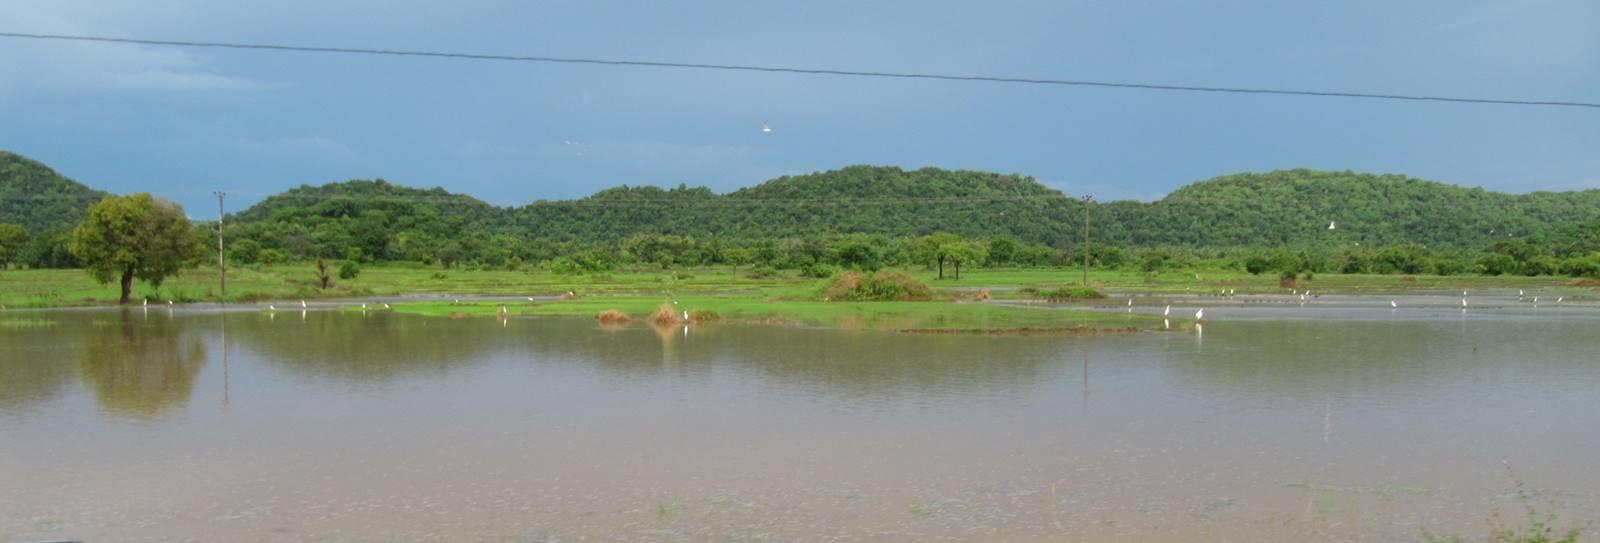 The Jayaraja Wewa which as become Vendarasan Tank